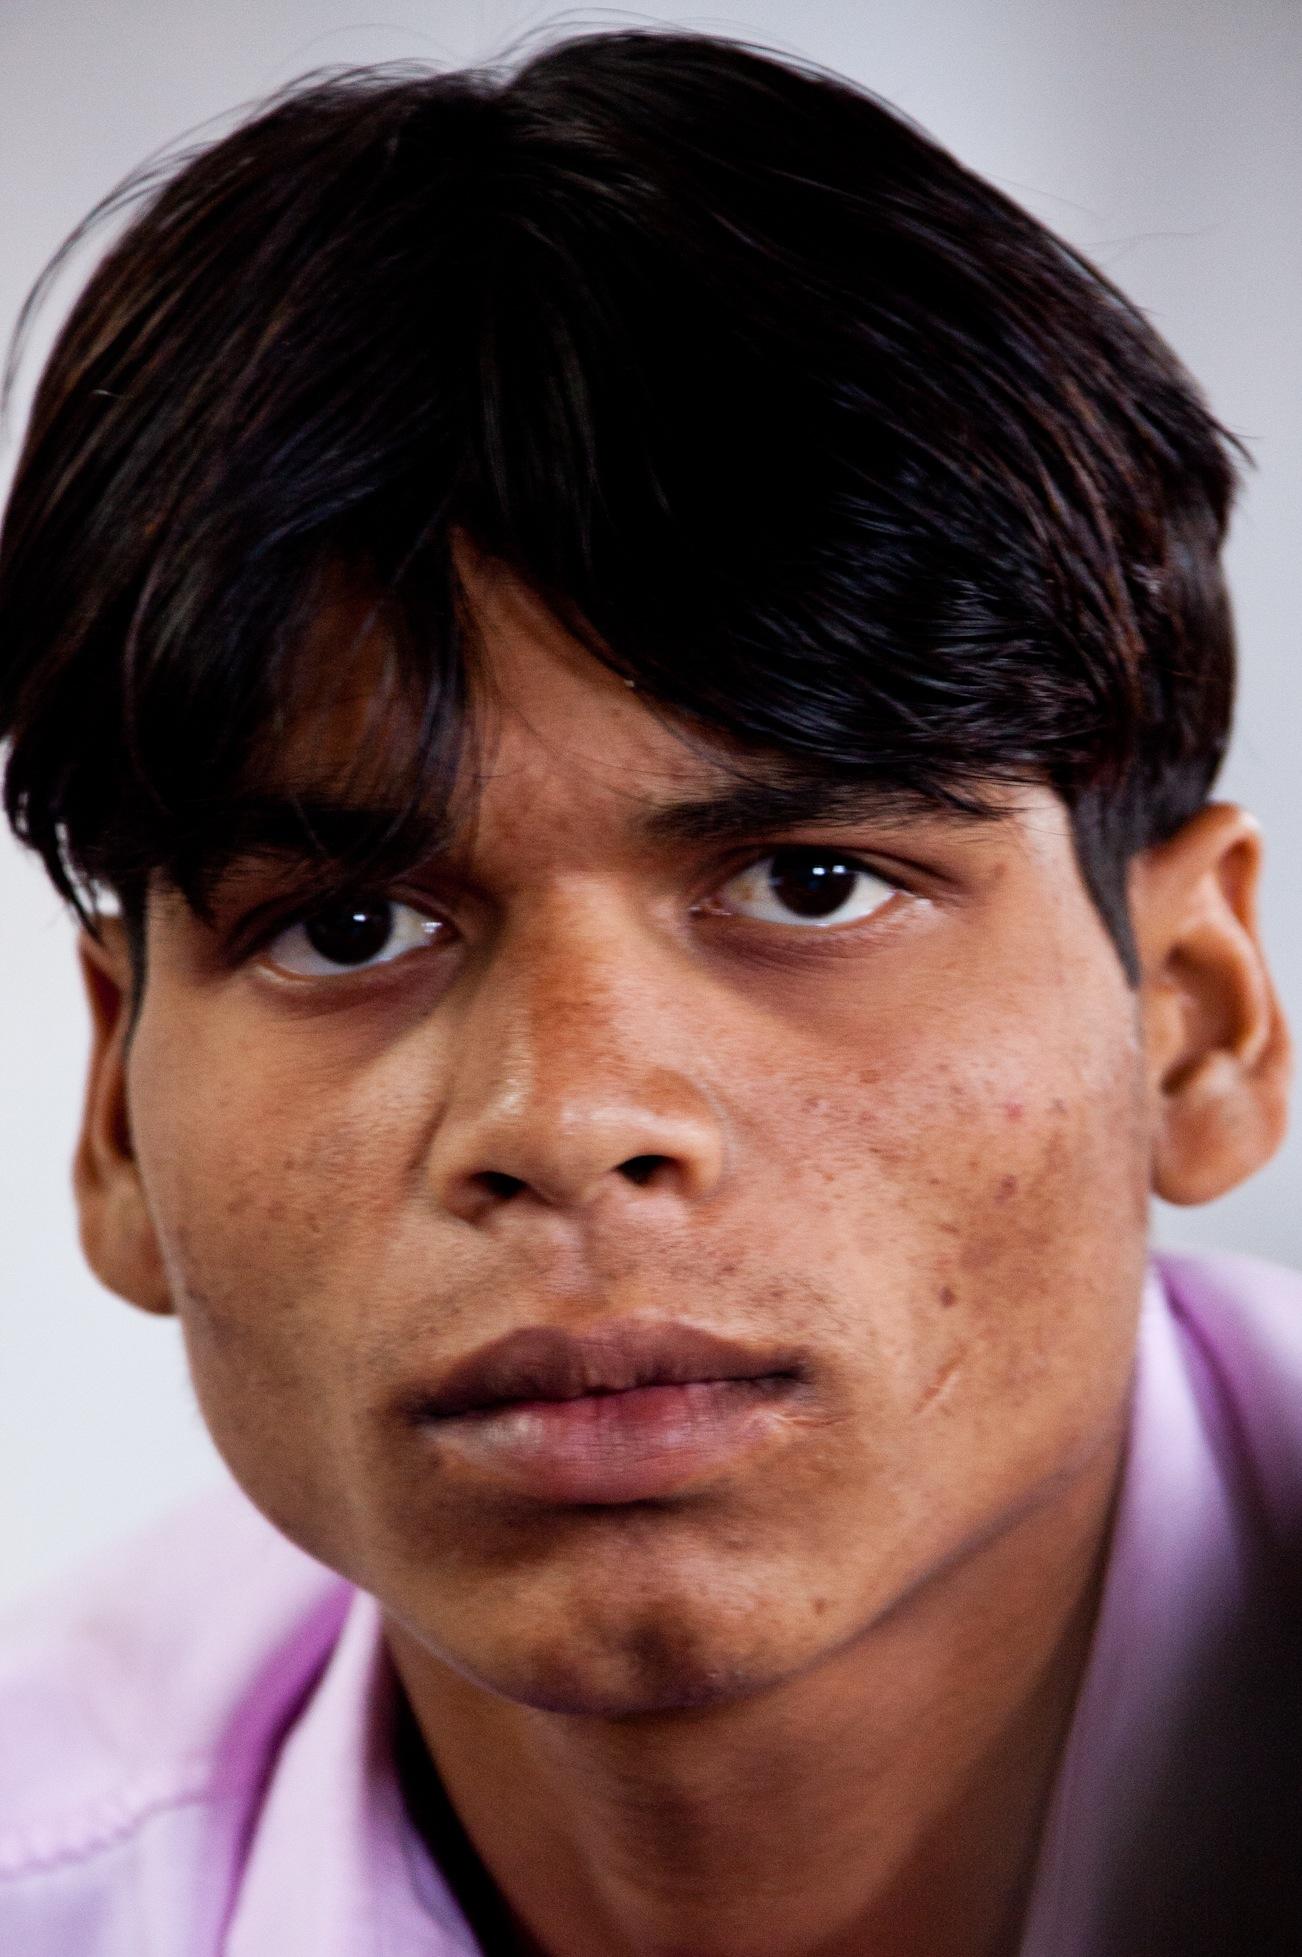 india stare / blog of photographer steven gray